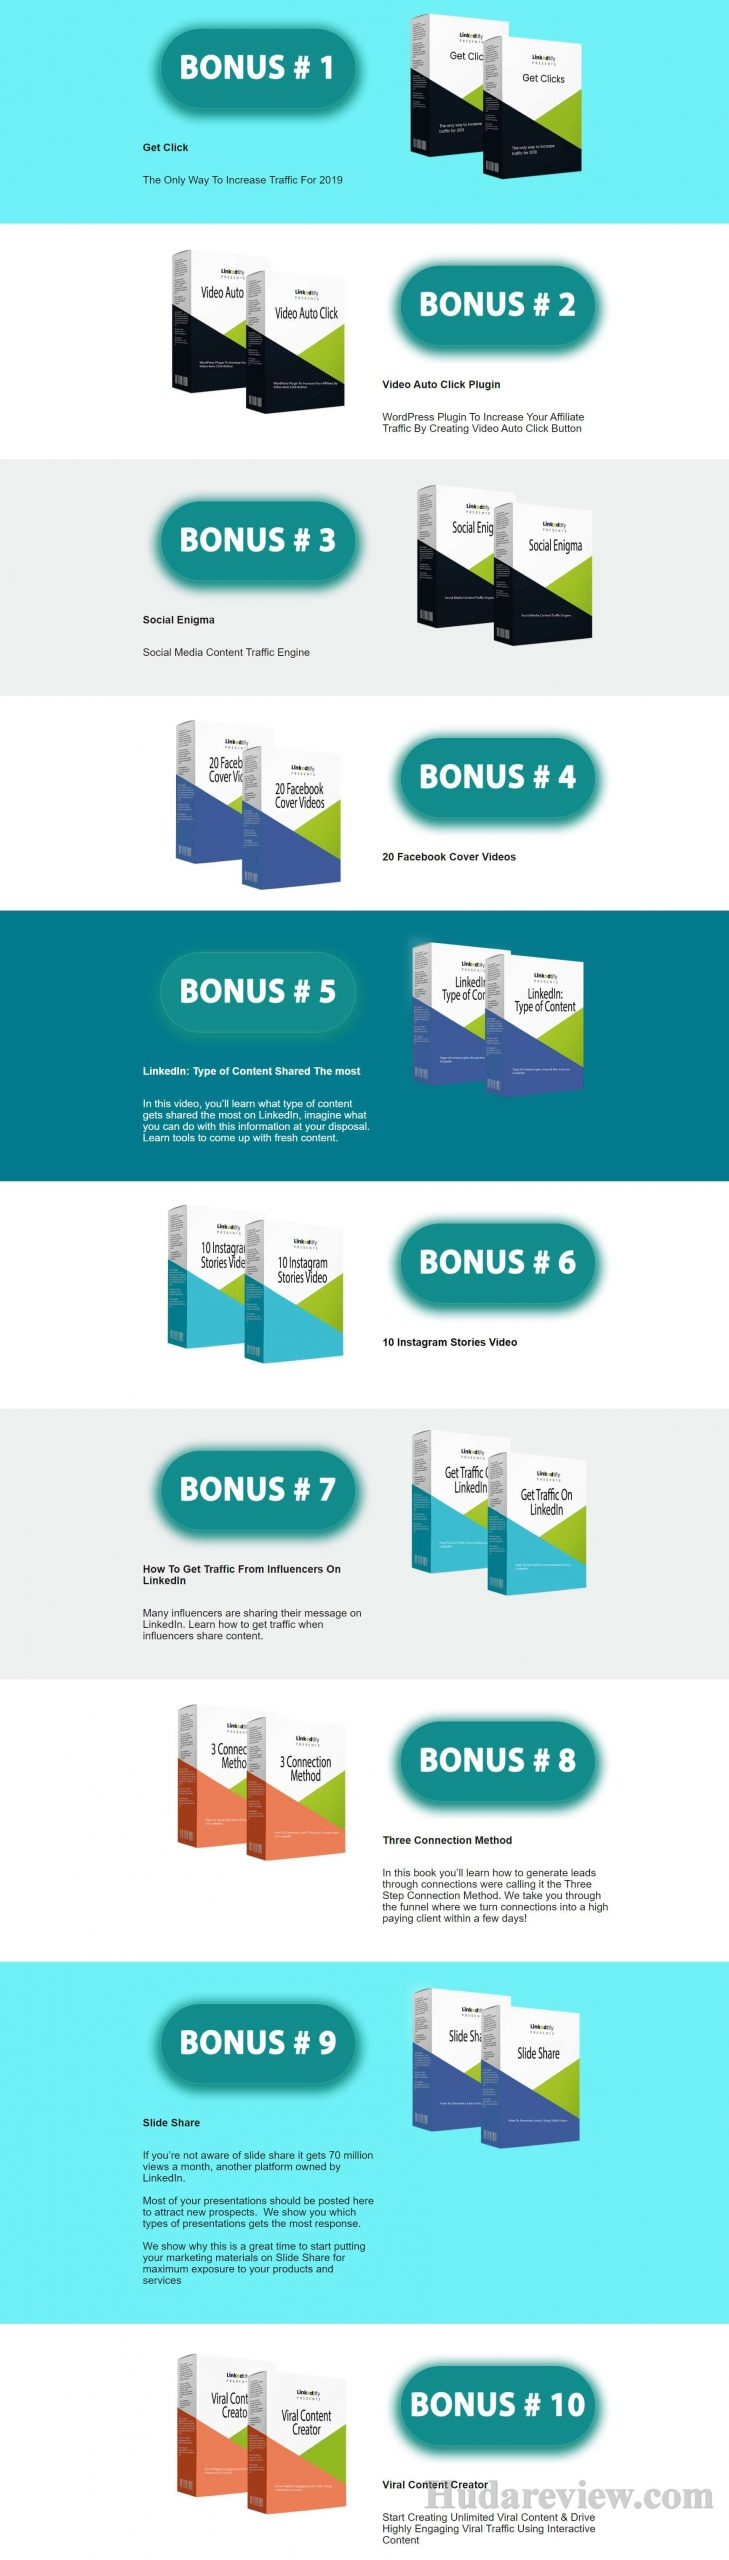 Linkedtify-Review-Bonuses